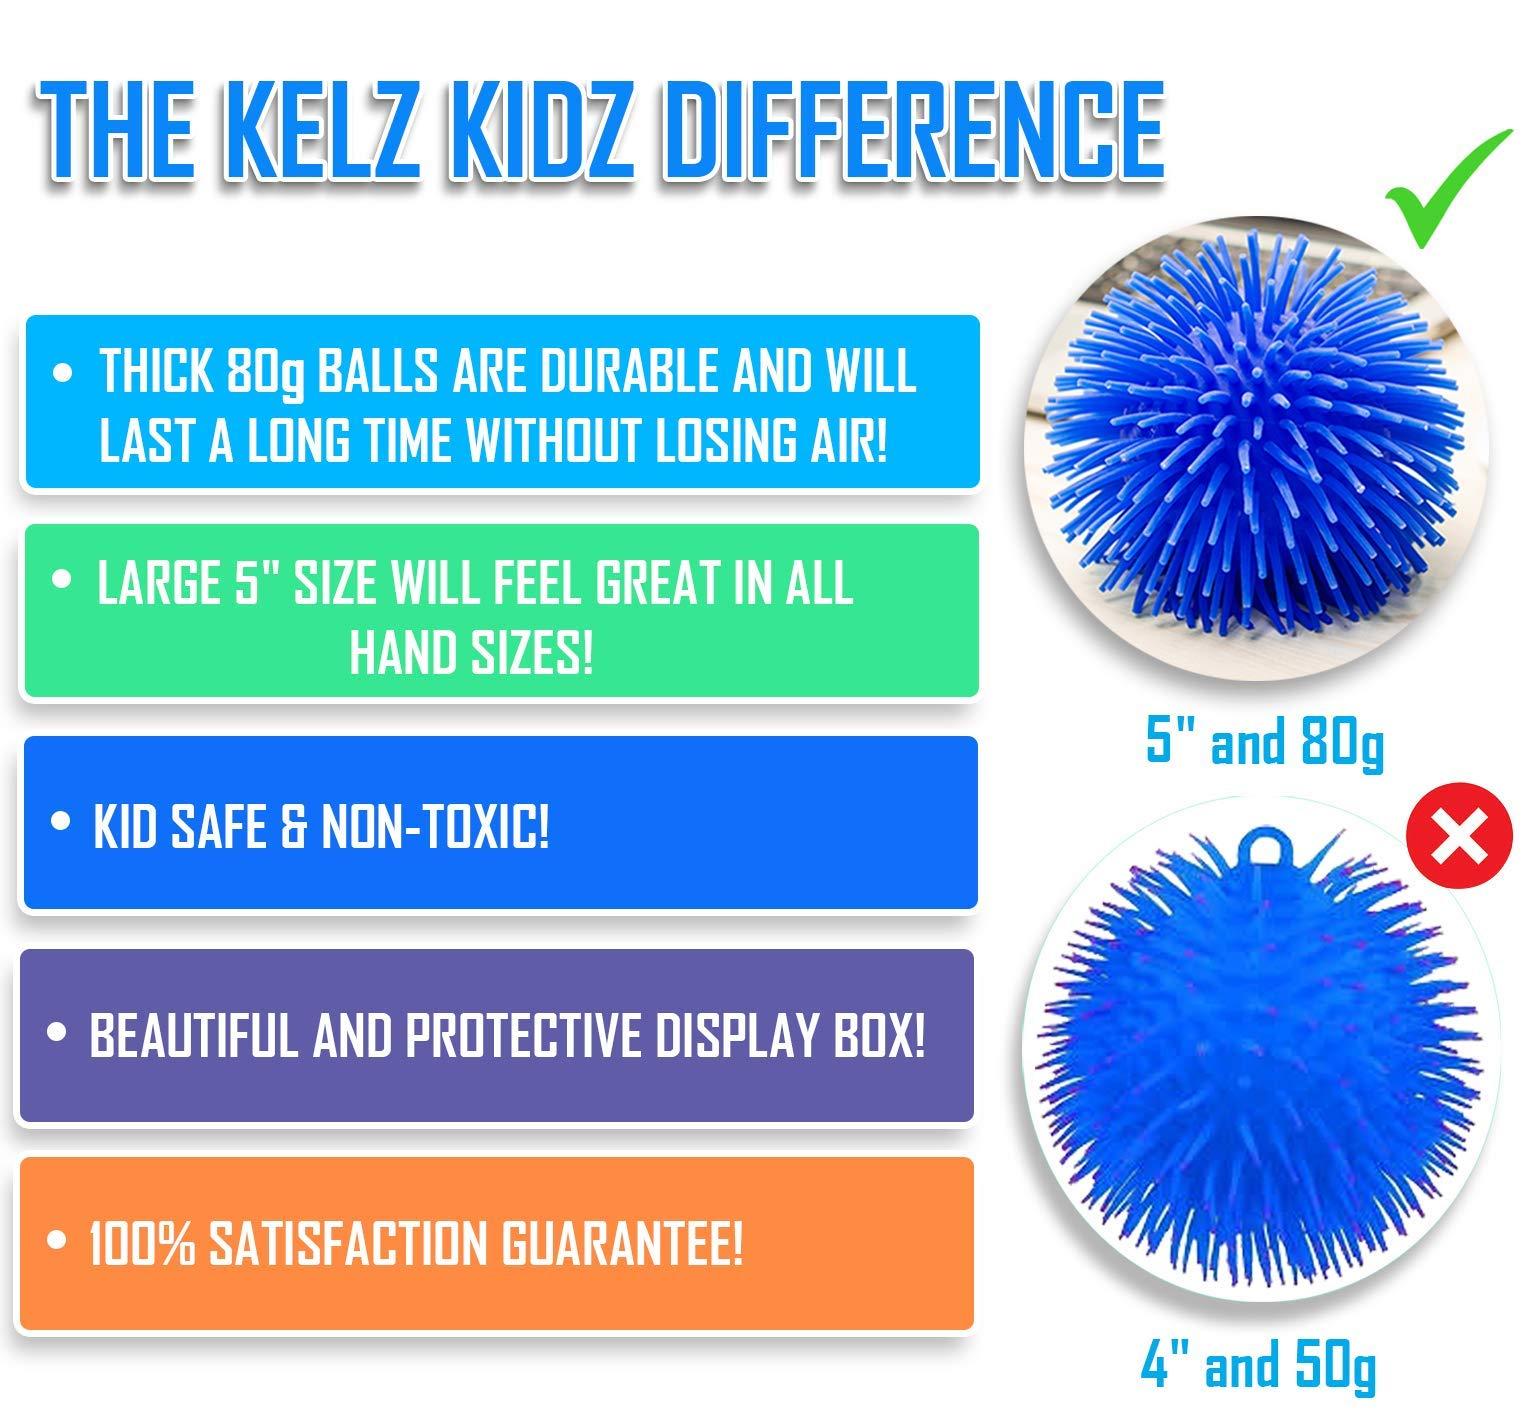 KELZ KIDZ Premium Quality Large & Thick Puffer Balls for Fun Kids Party (Set of 12) by KELZ KIDZ (Image #4)